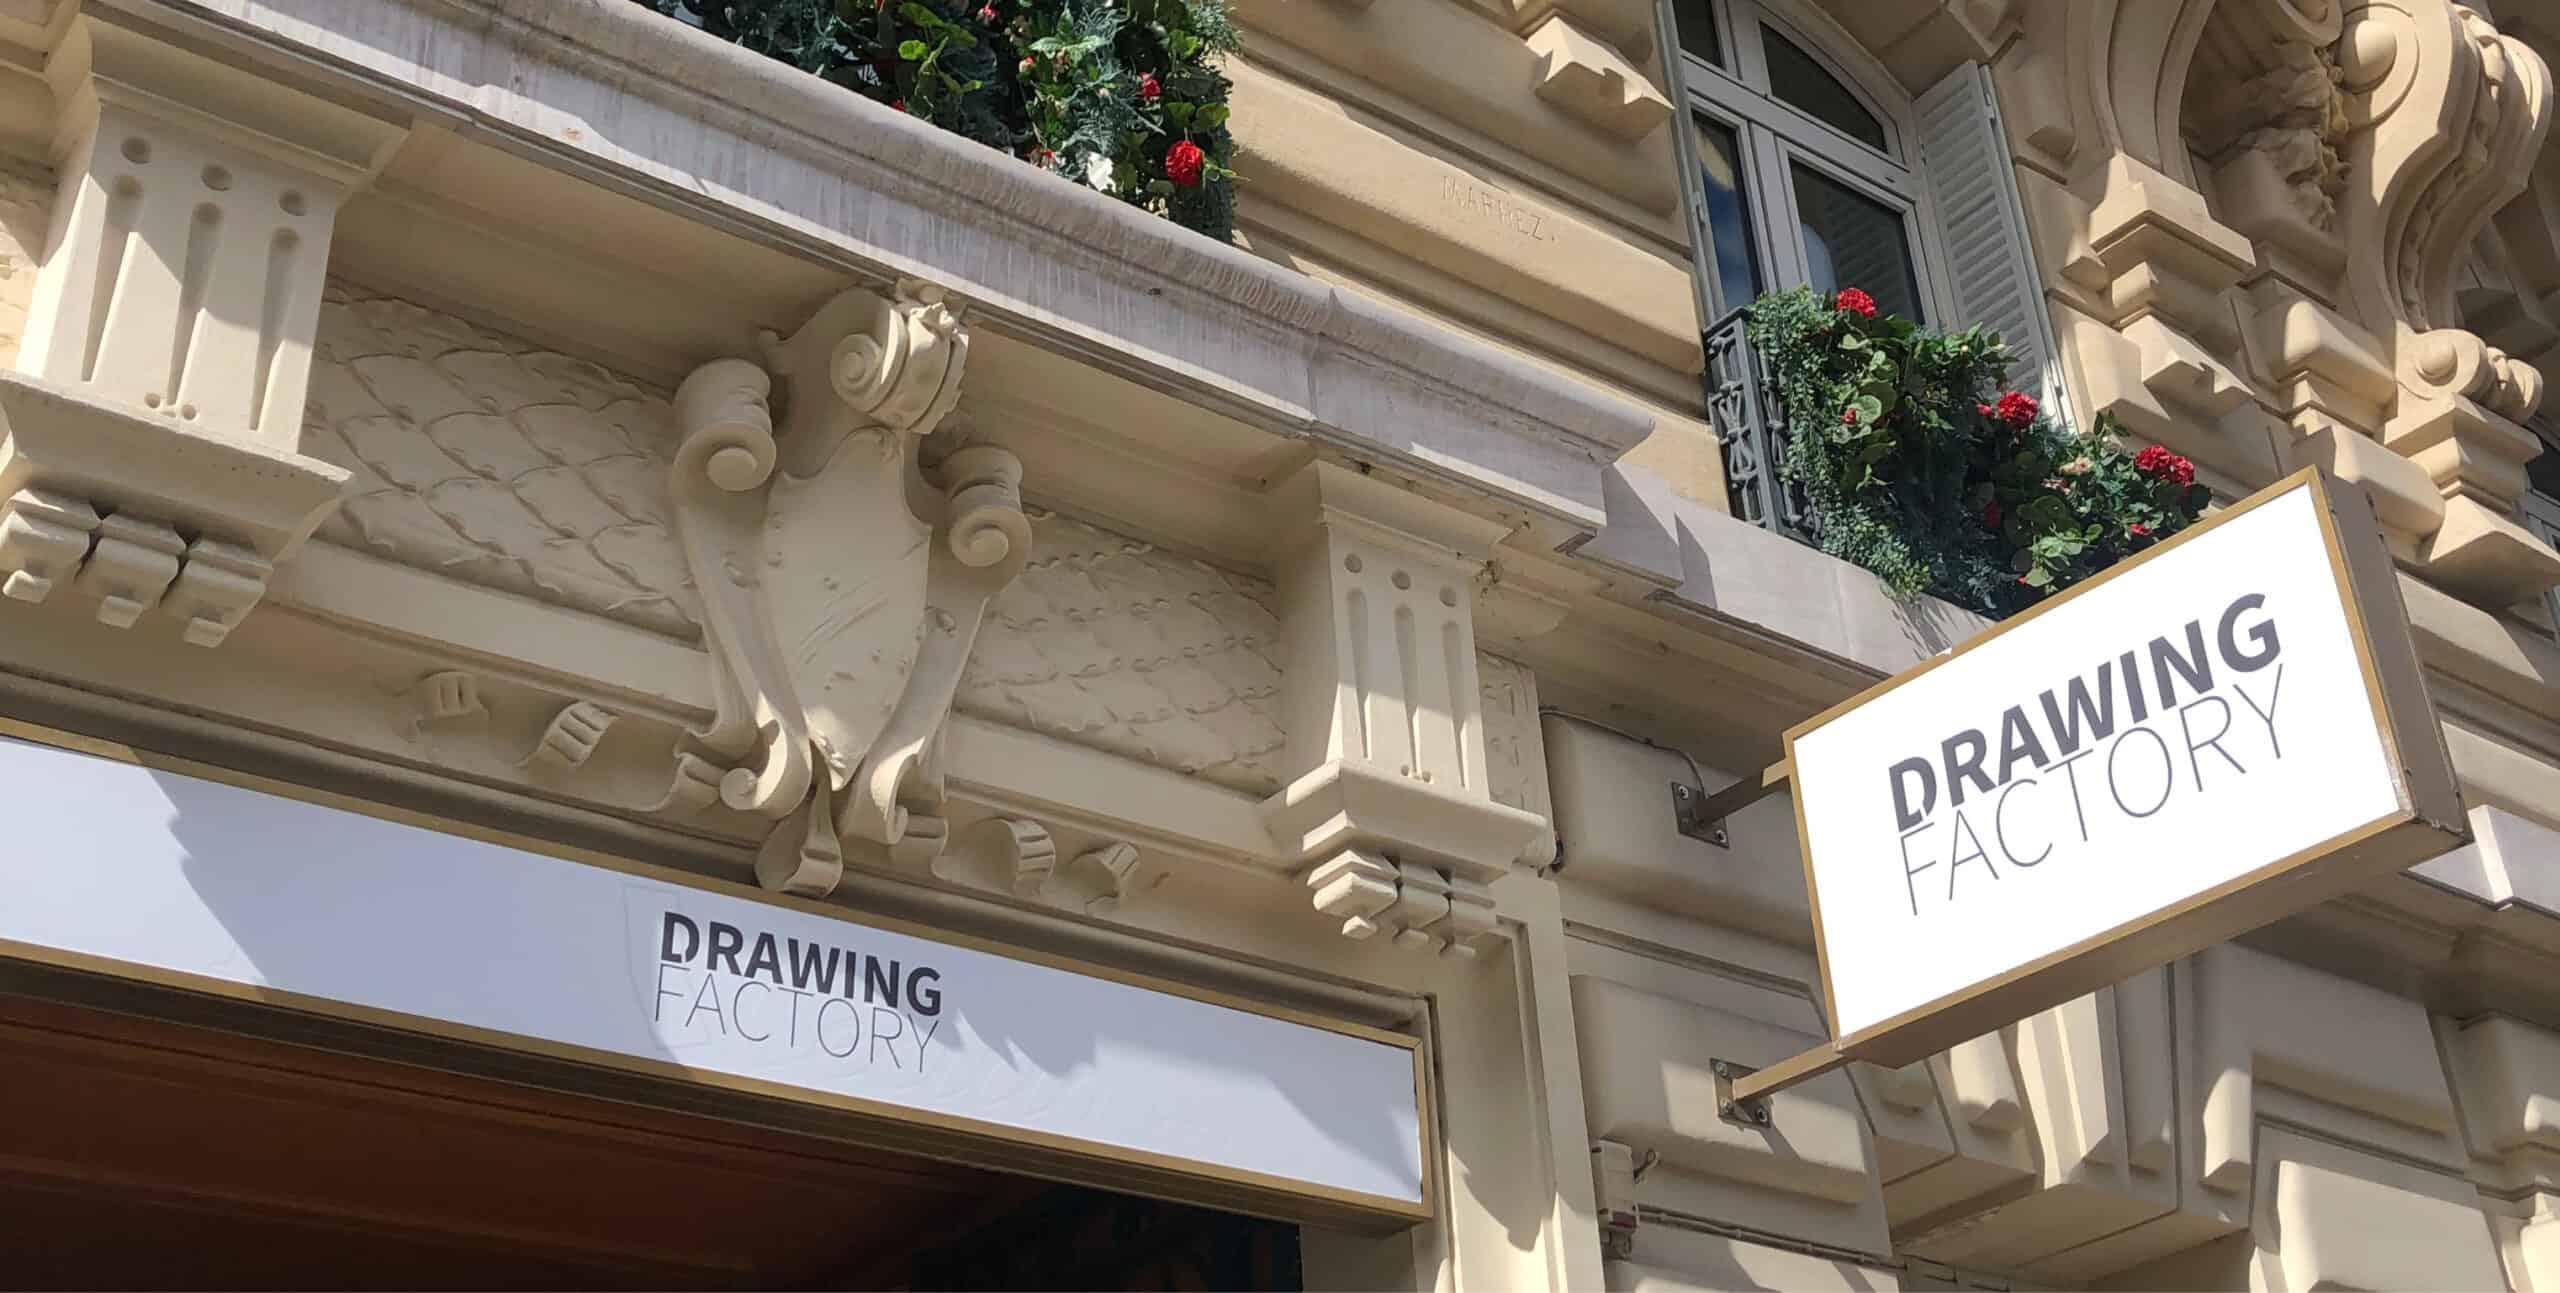 Vue façade DRAWING FACTORY, 11 avenue Mac-Mahon 75008 Paris